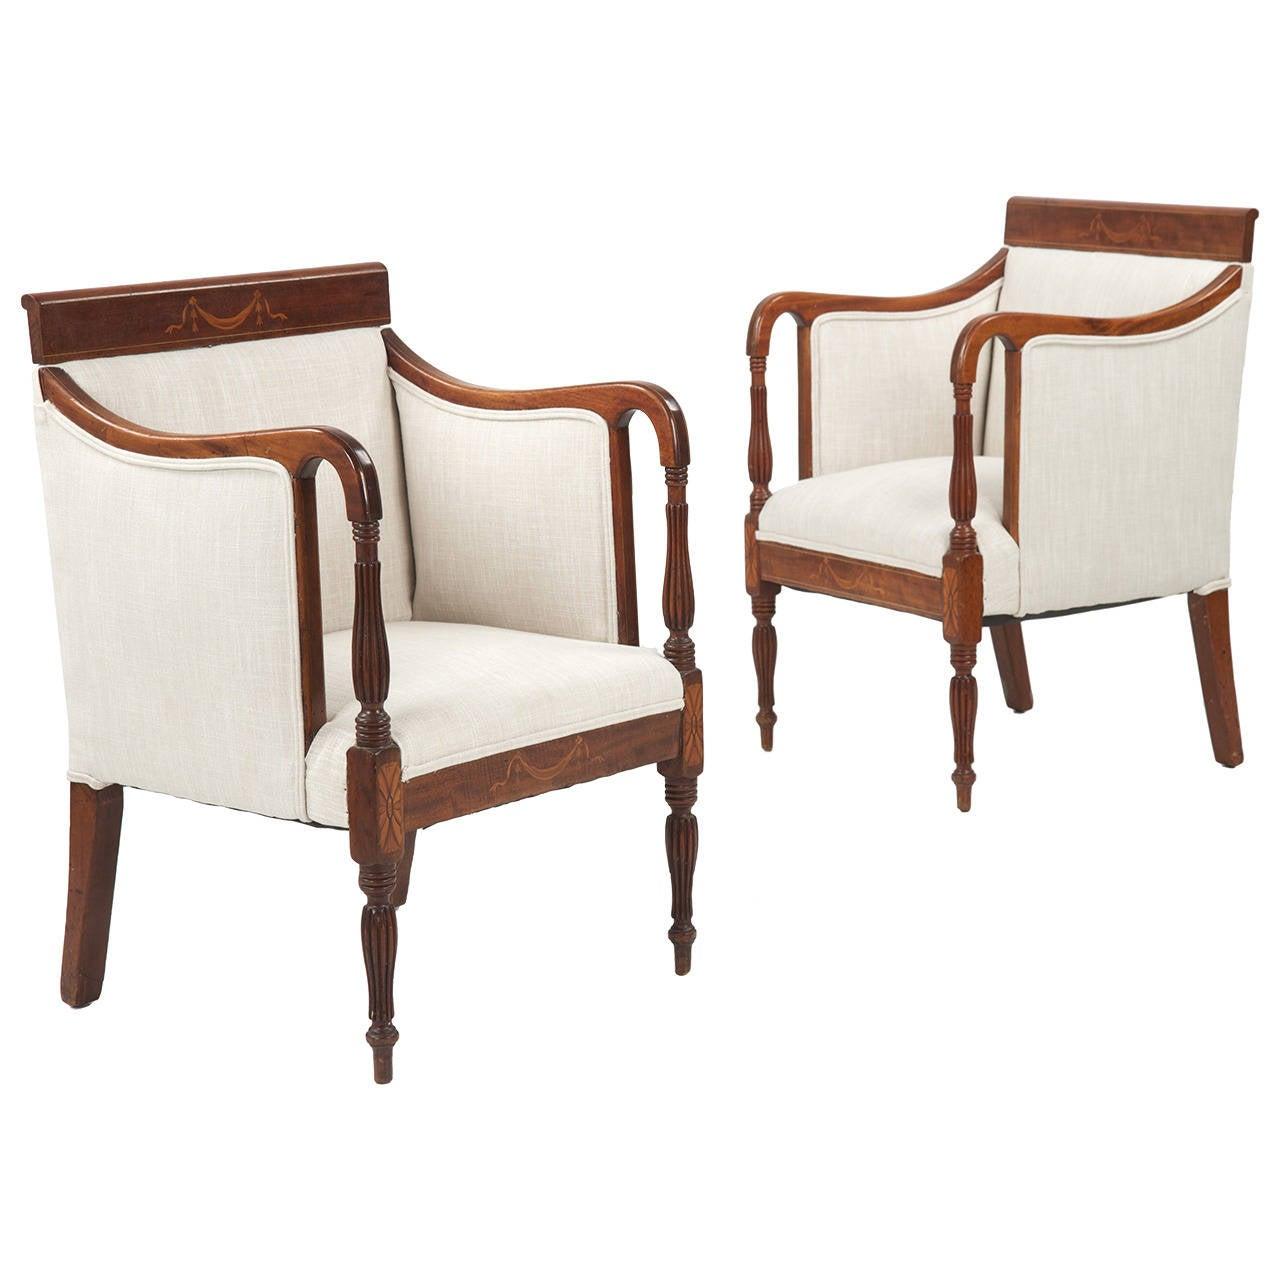 chair antique styles cap strength roman reviews arm chairs furniture